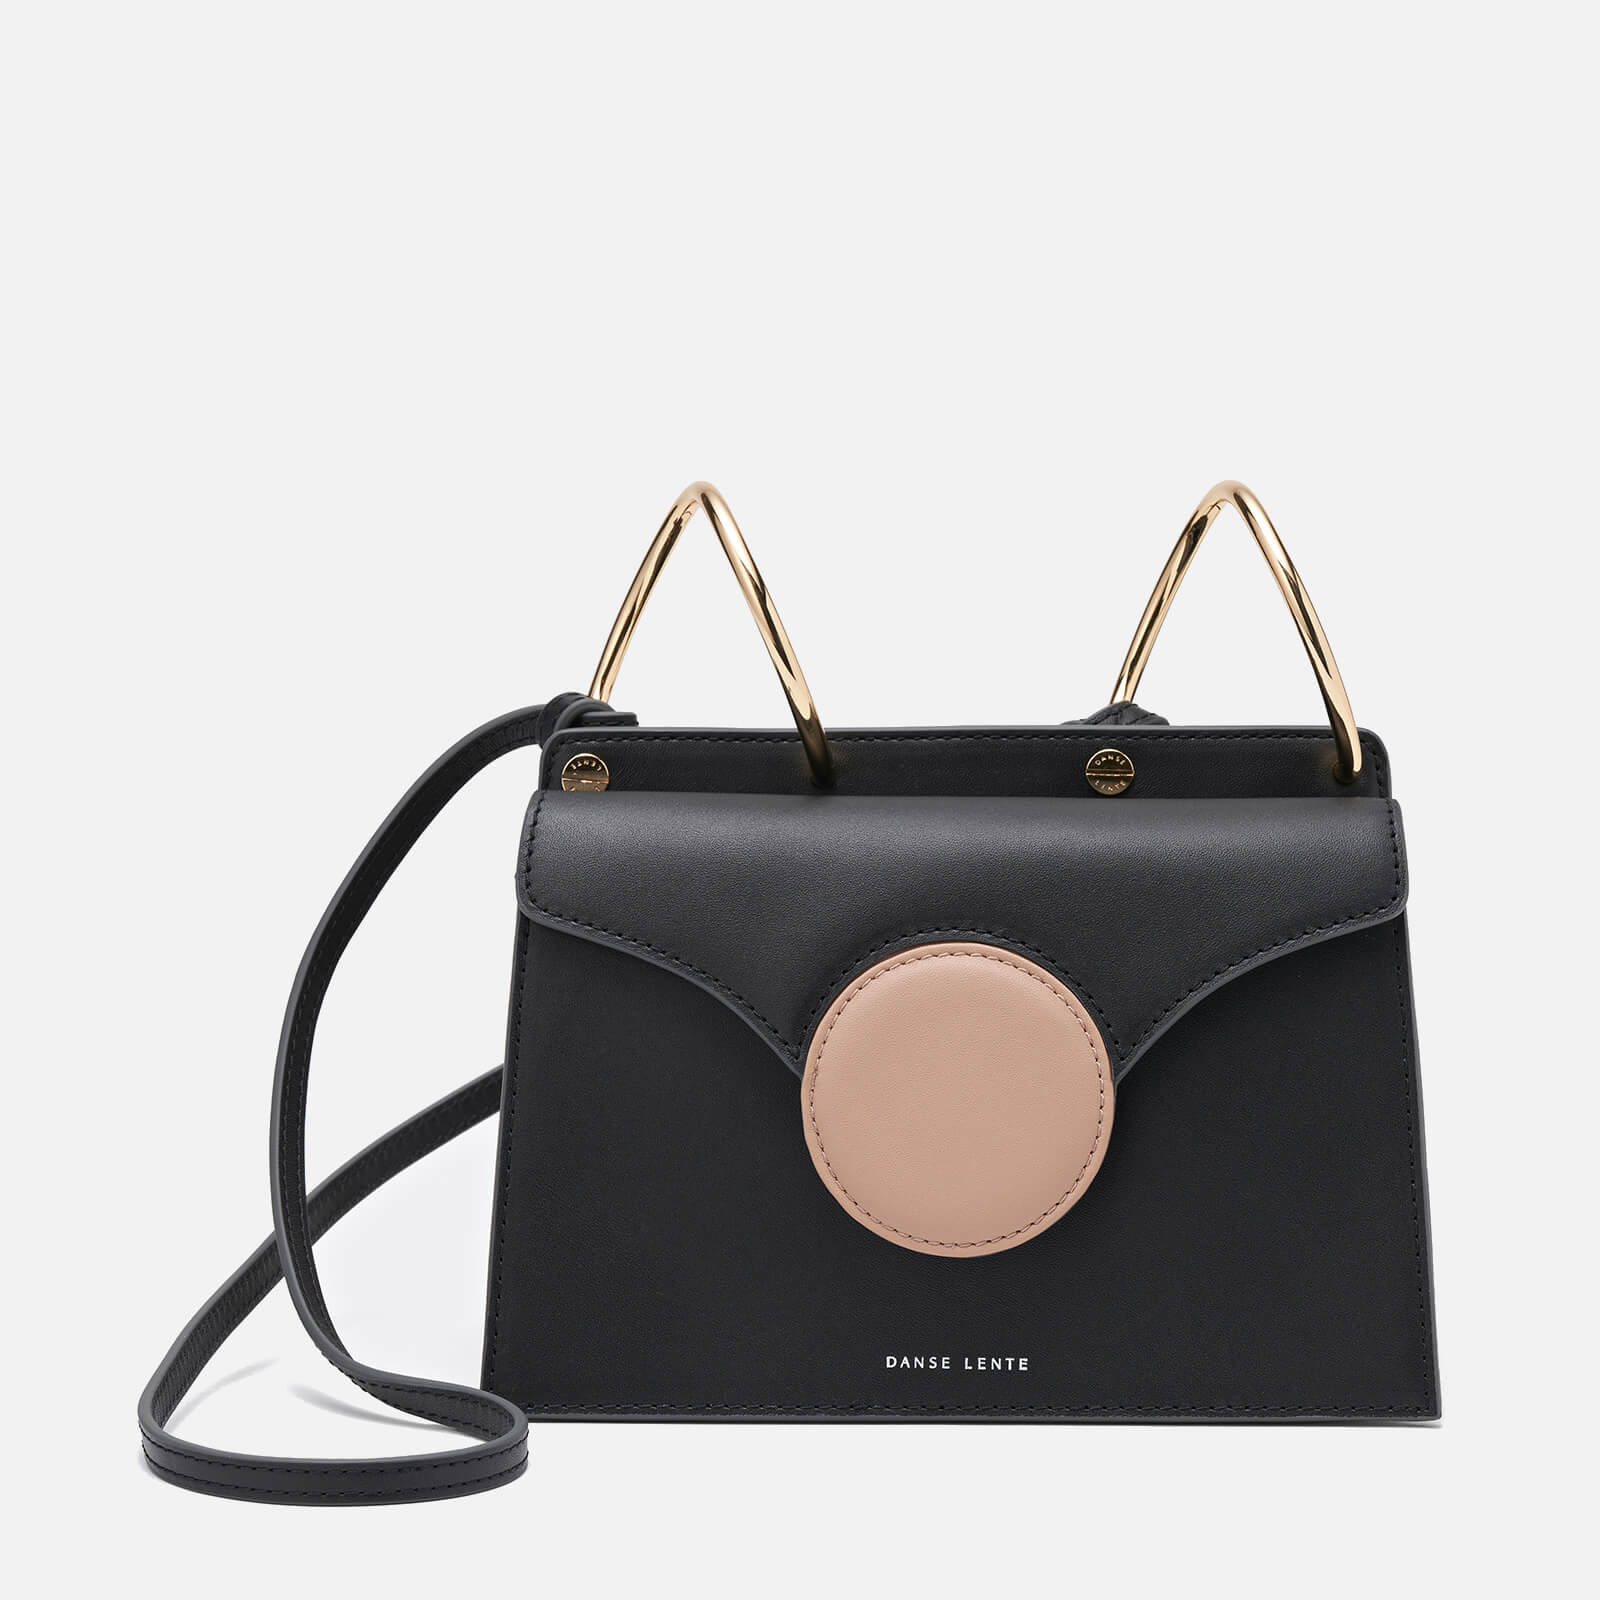 Danse Lente Women's Mini Phoebe Cross Body Bag - Cashew/Black